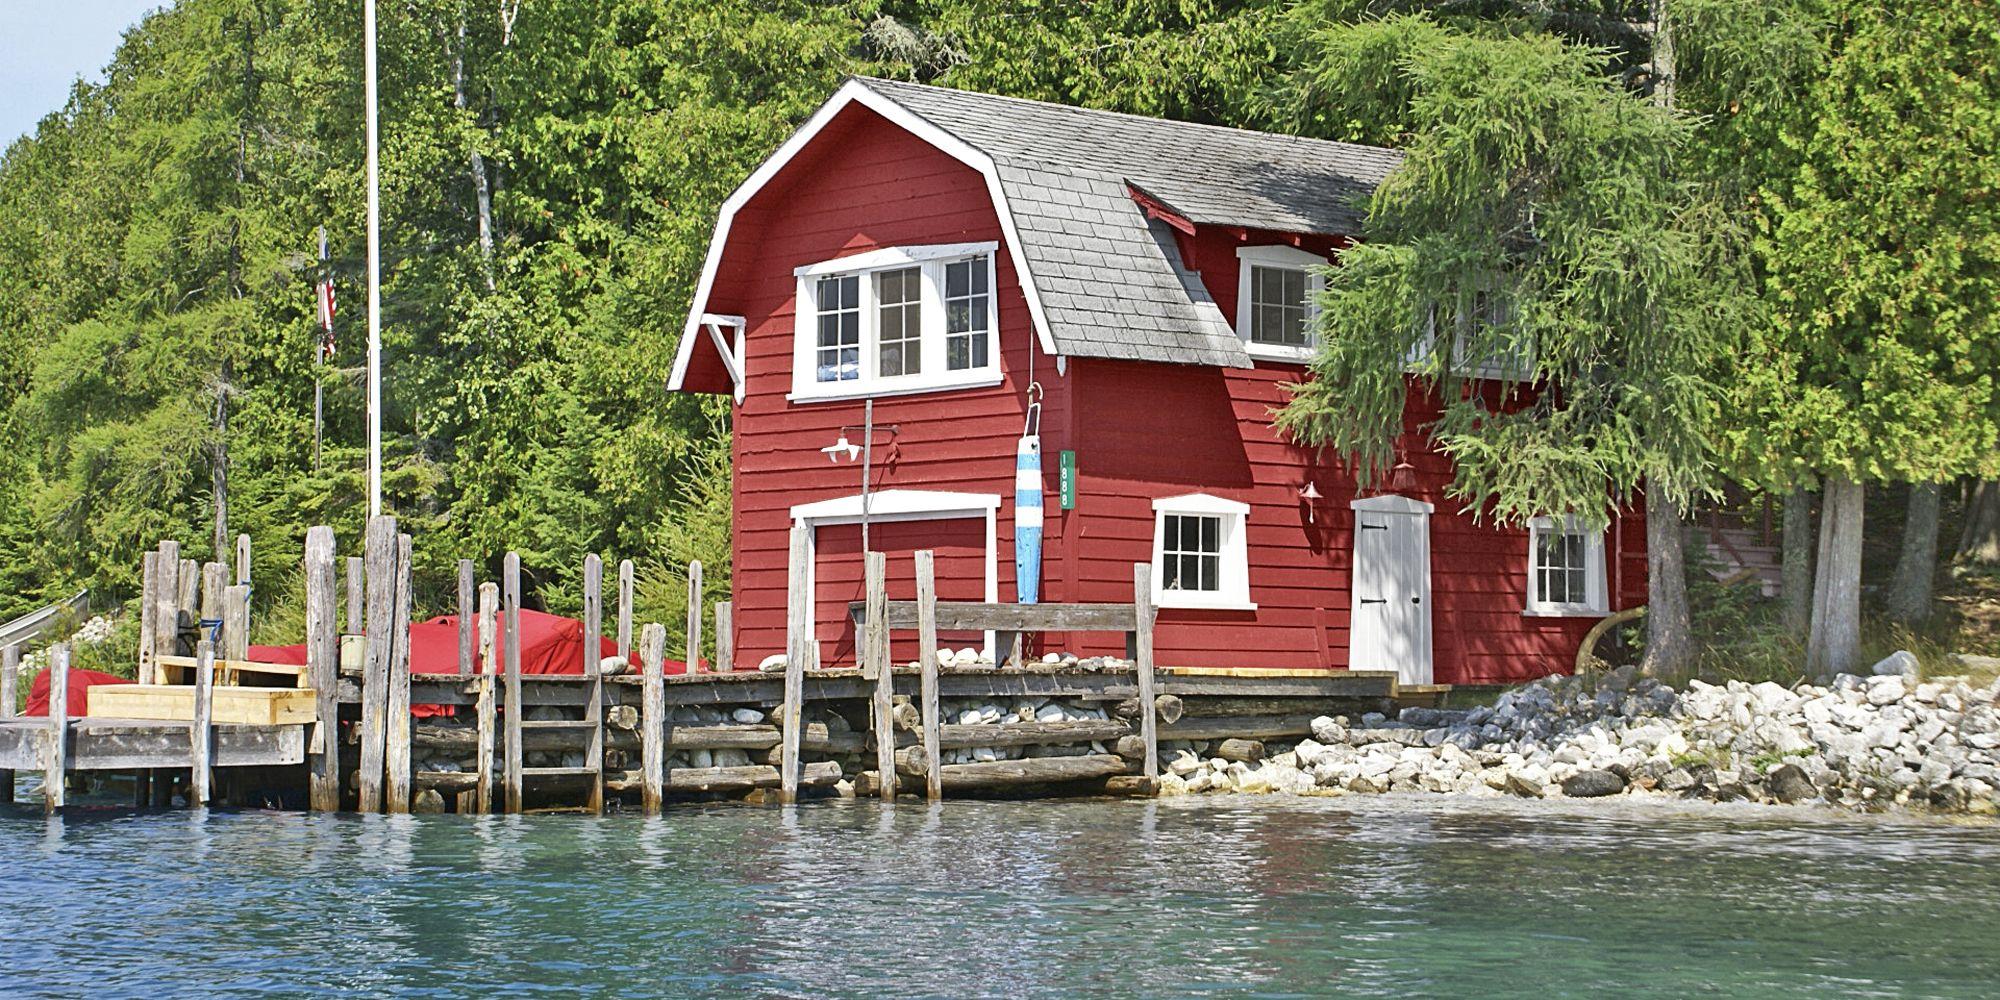 20 Beautiful Lake Homes for Sale   Lake House Real Estate Listings